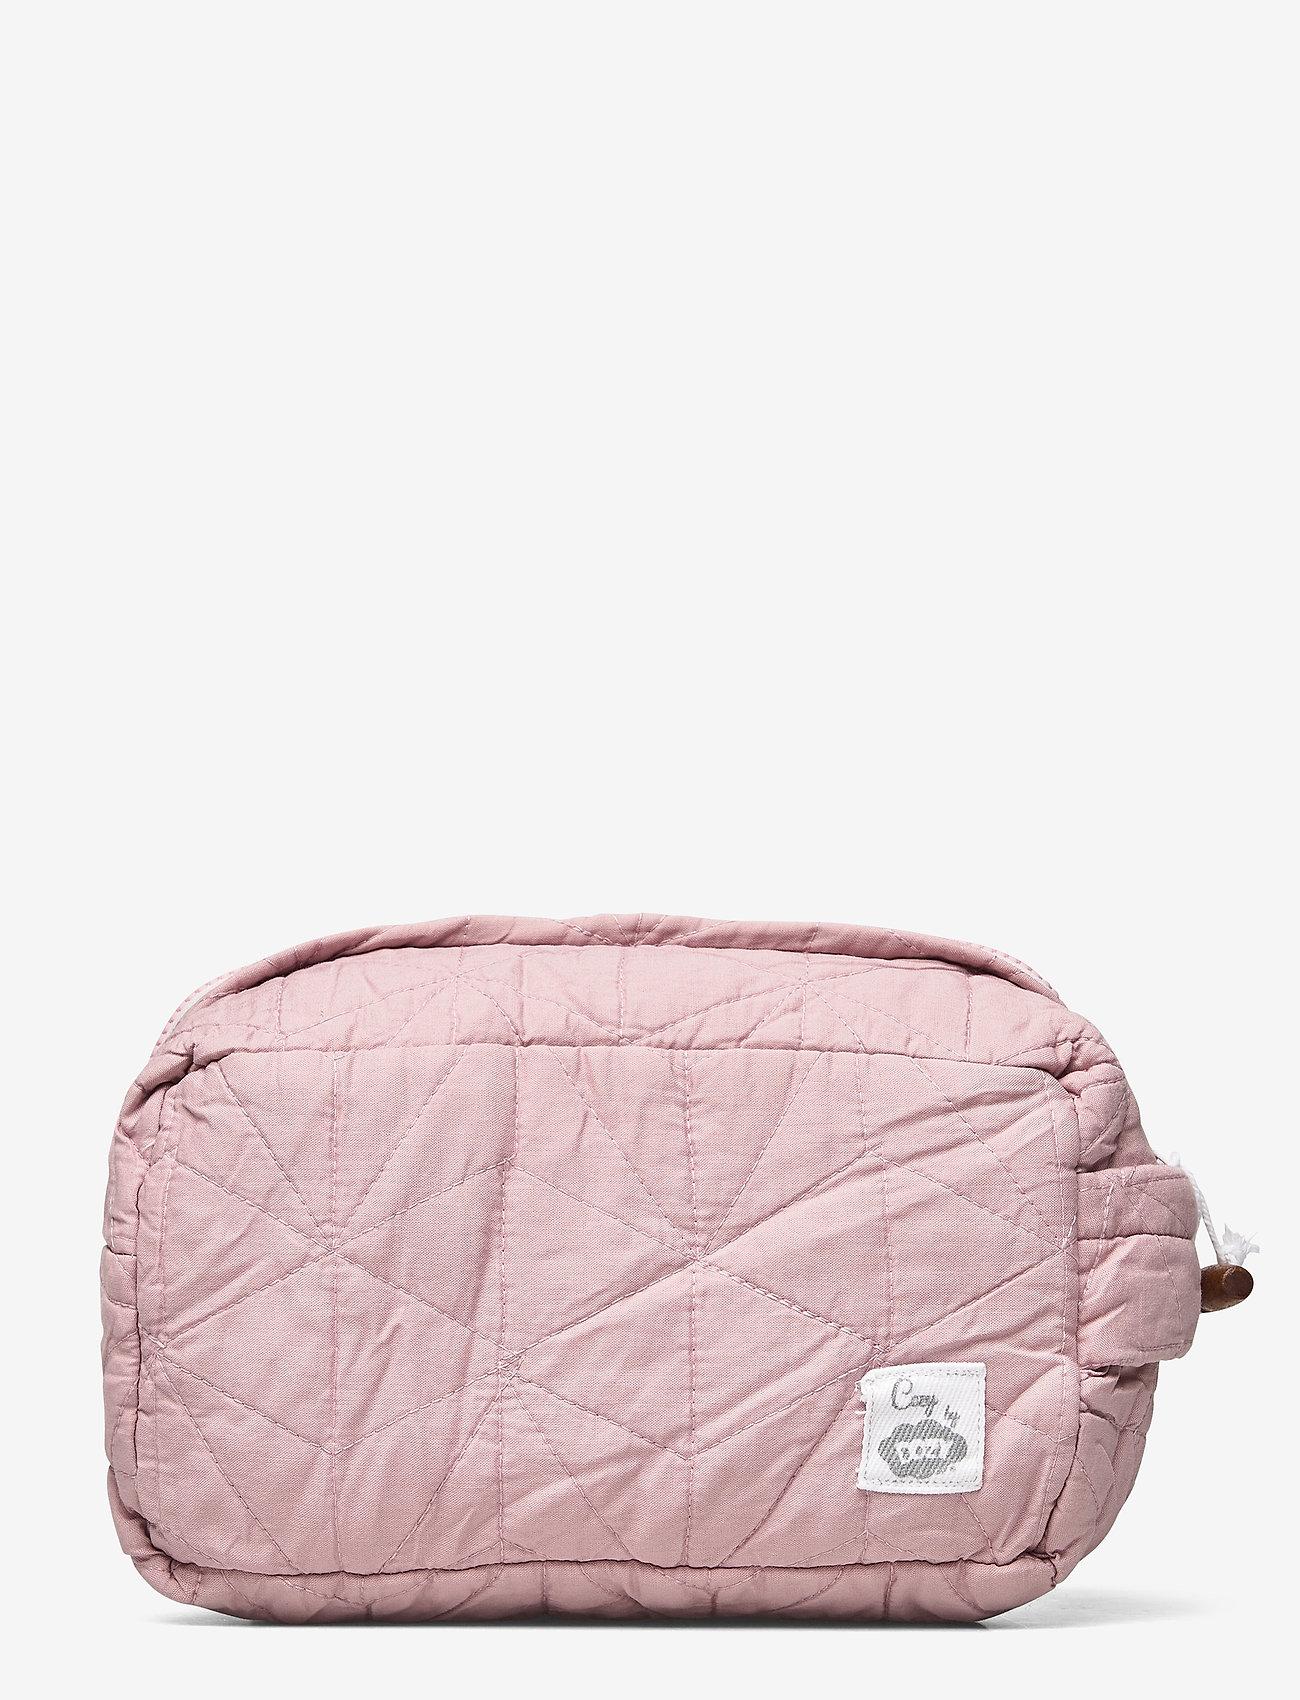 Cozy by Dozy - Cozy by Dozy Toiletry Bag - toiletry bags - pink - 0